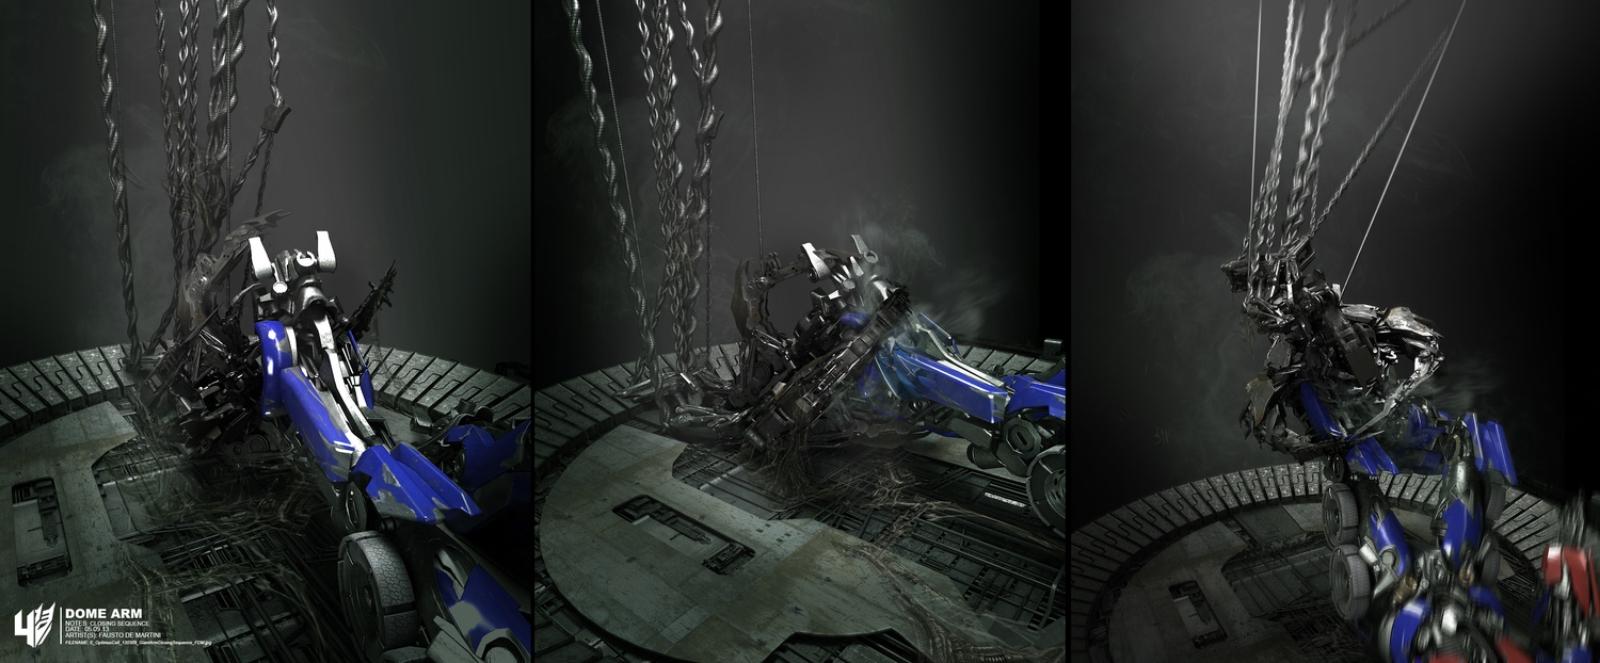 E_OptimusCell_130509_GiantArmClosingSequence_FDM.jpg